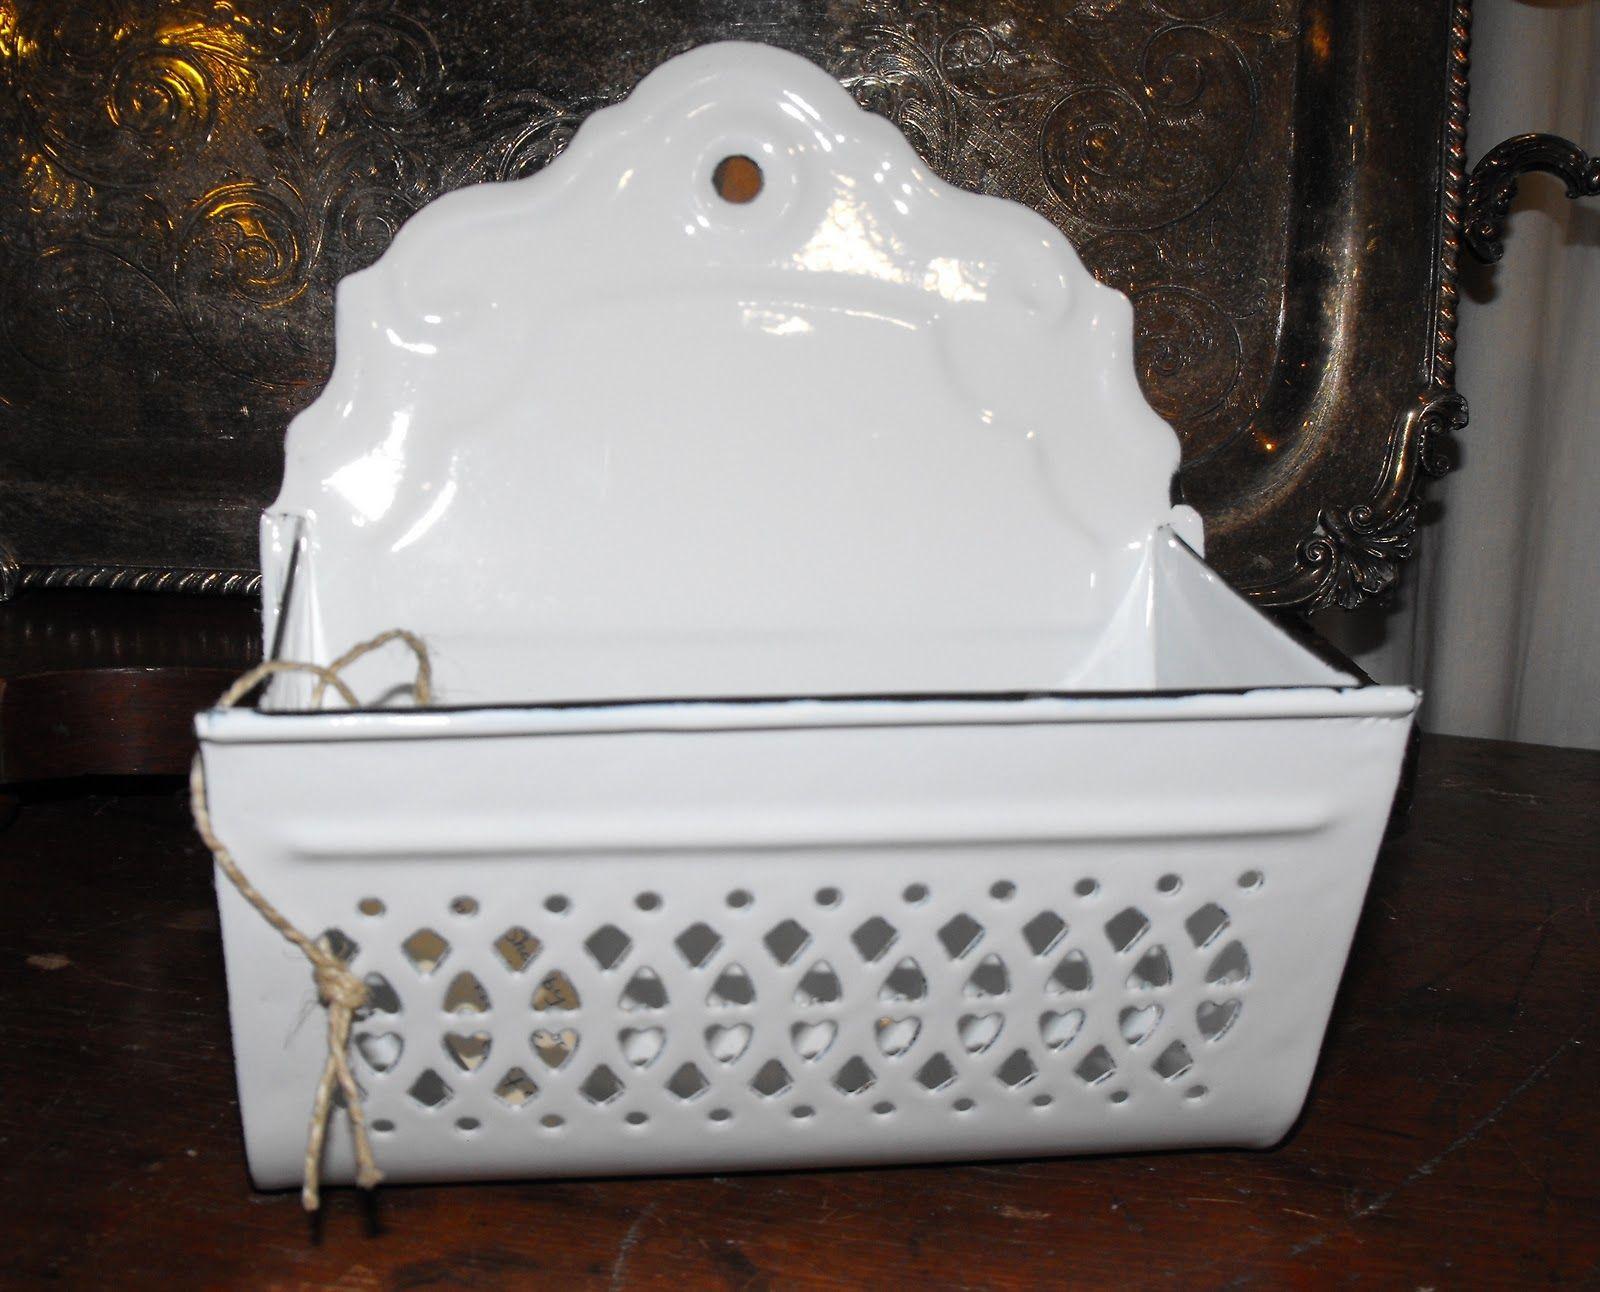 vintage enamelwares | Enamel - Zand, Zeep, Soda Graniteware Laundry ...